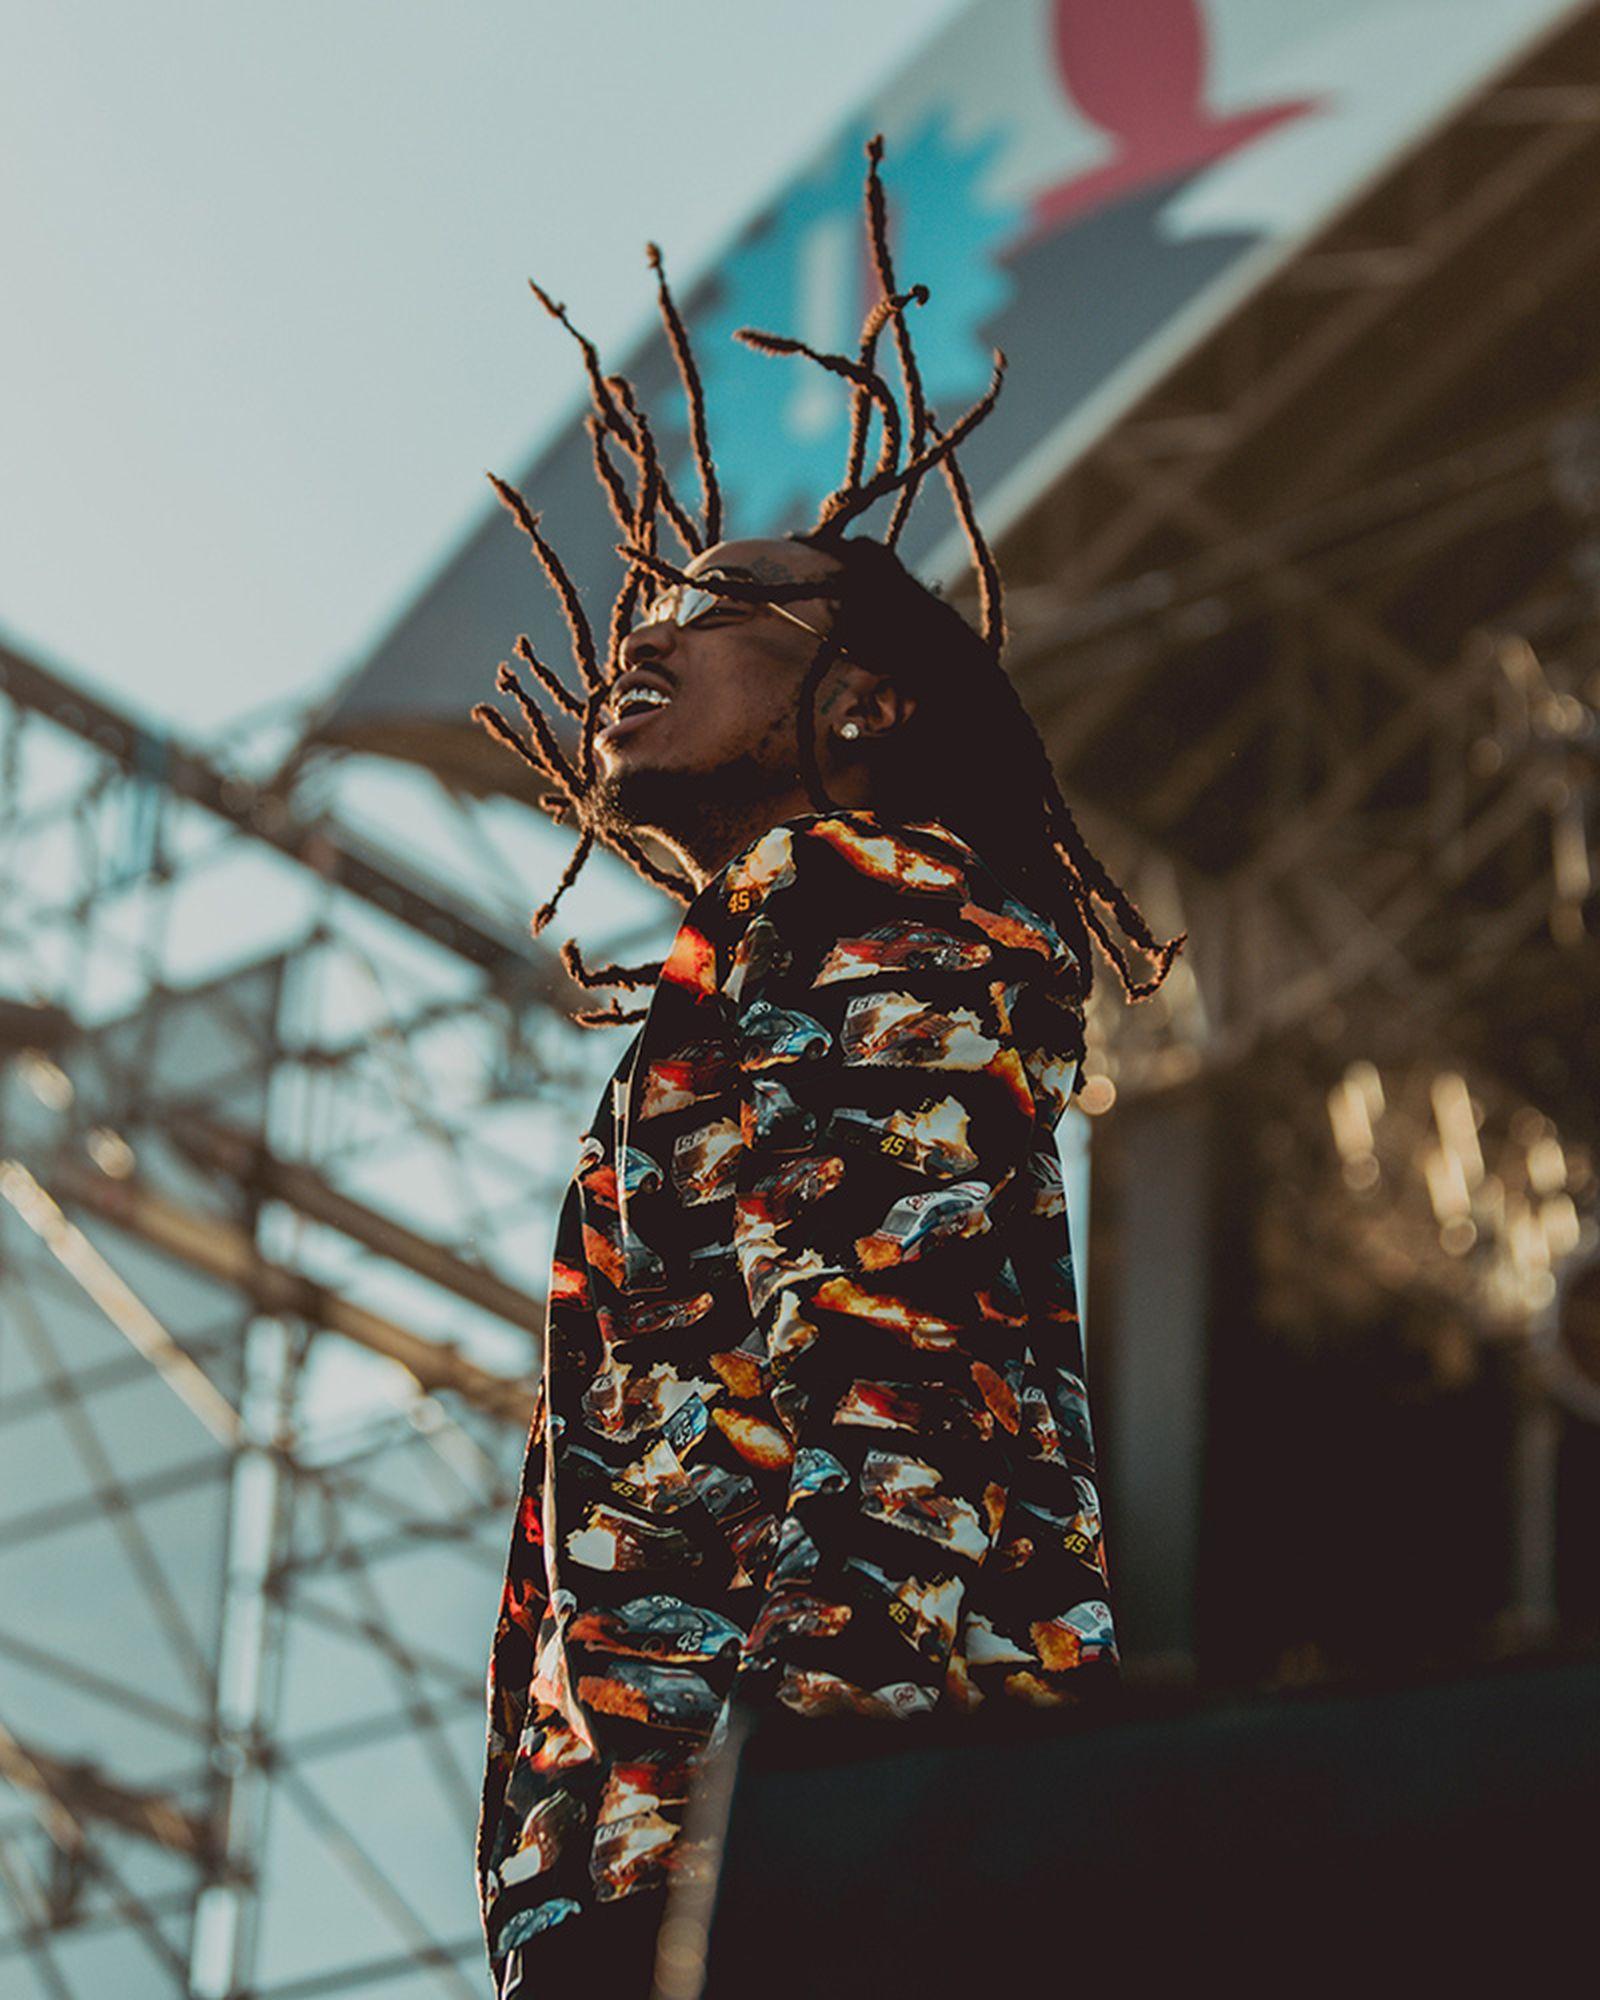 the-ultimate-music-festival-guide-2020-04